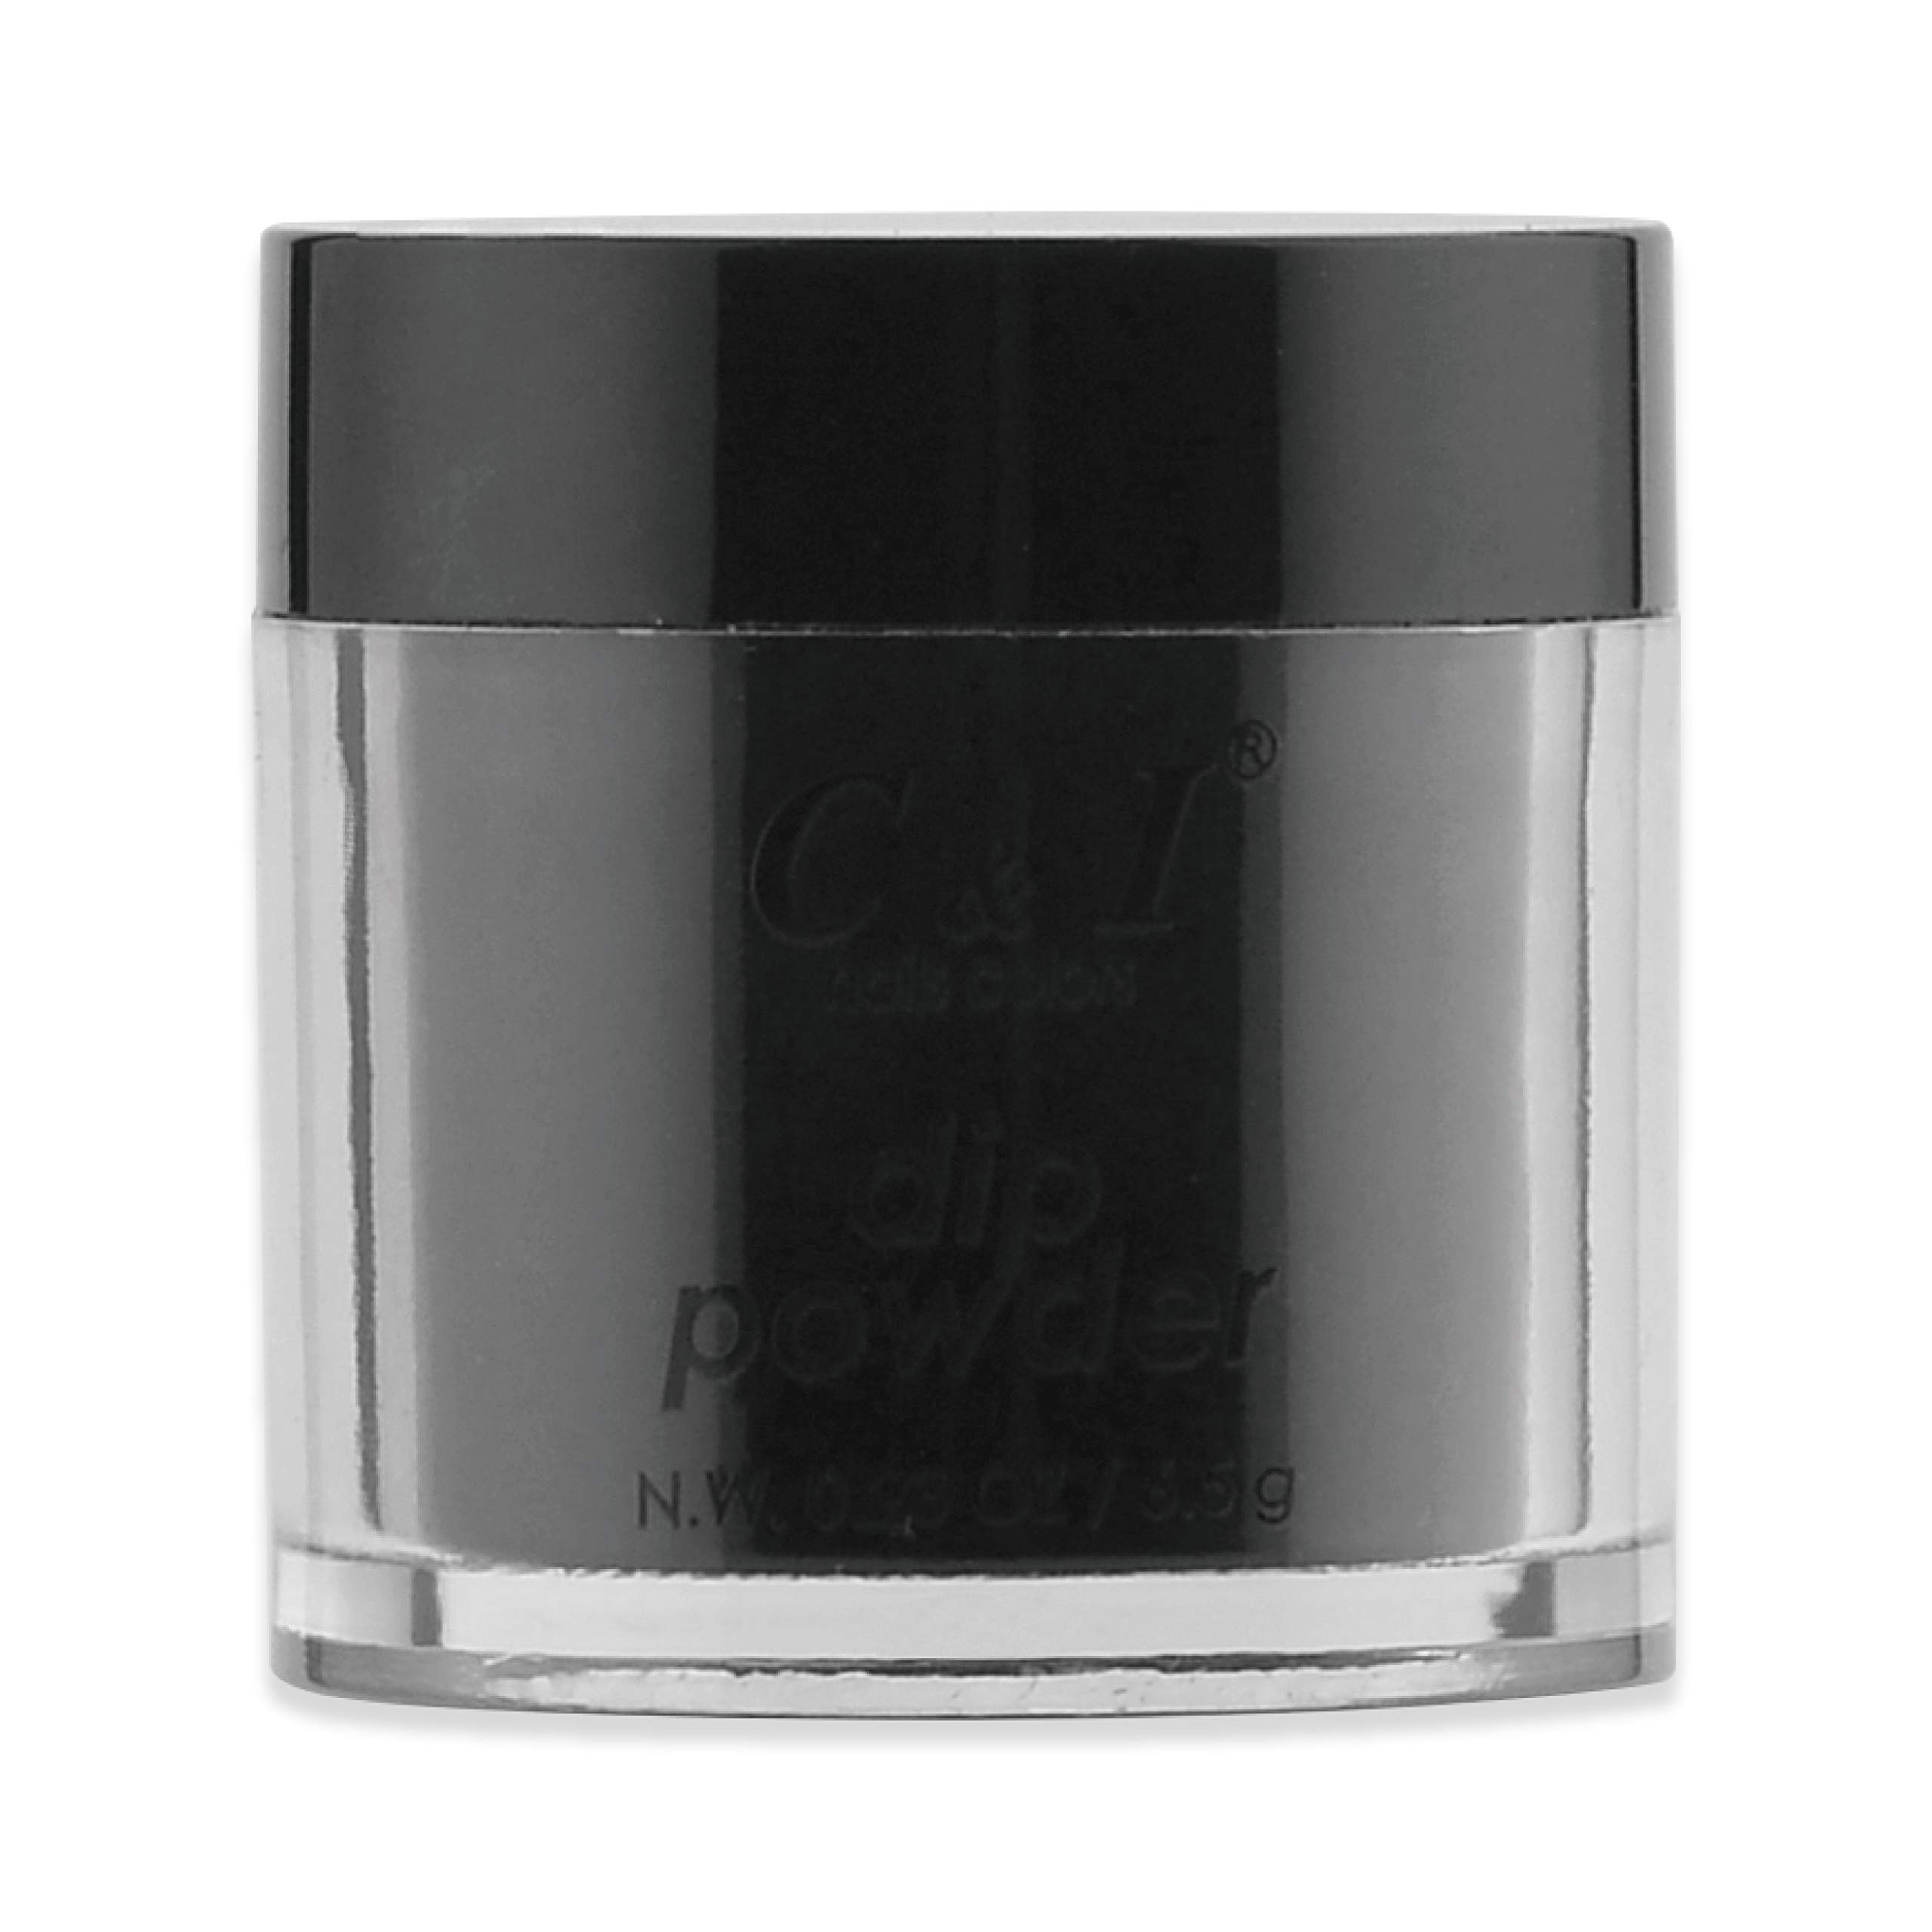 C & I Dipping Powder, Nail Colors, Gel Effect, Color # 4 Black, 0.23 oz, 6.5 g, Builder Color System (1 pc)